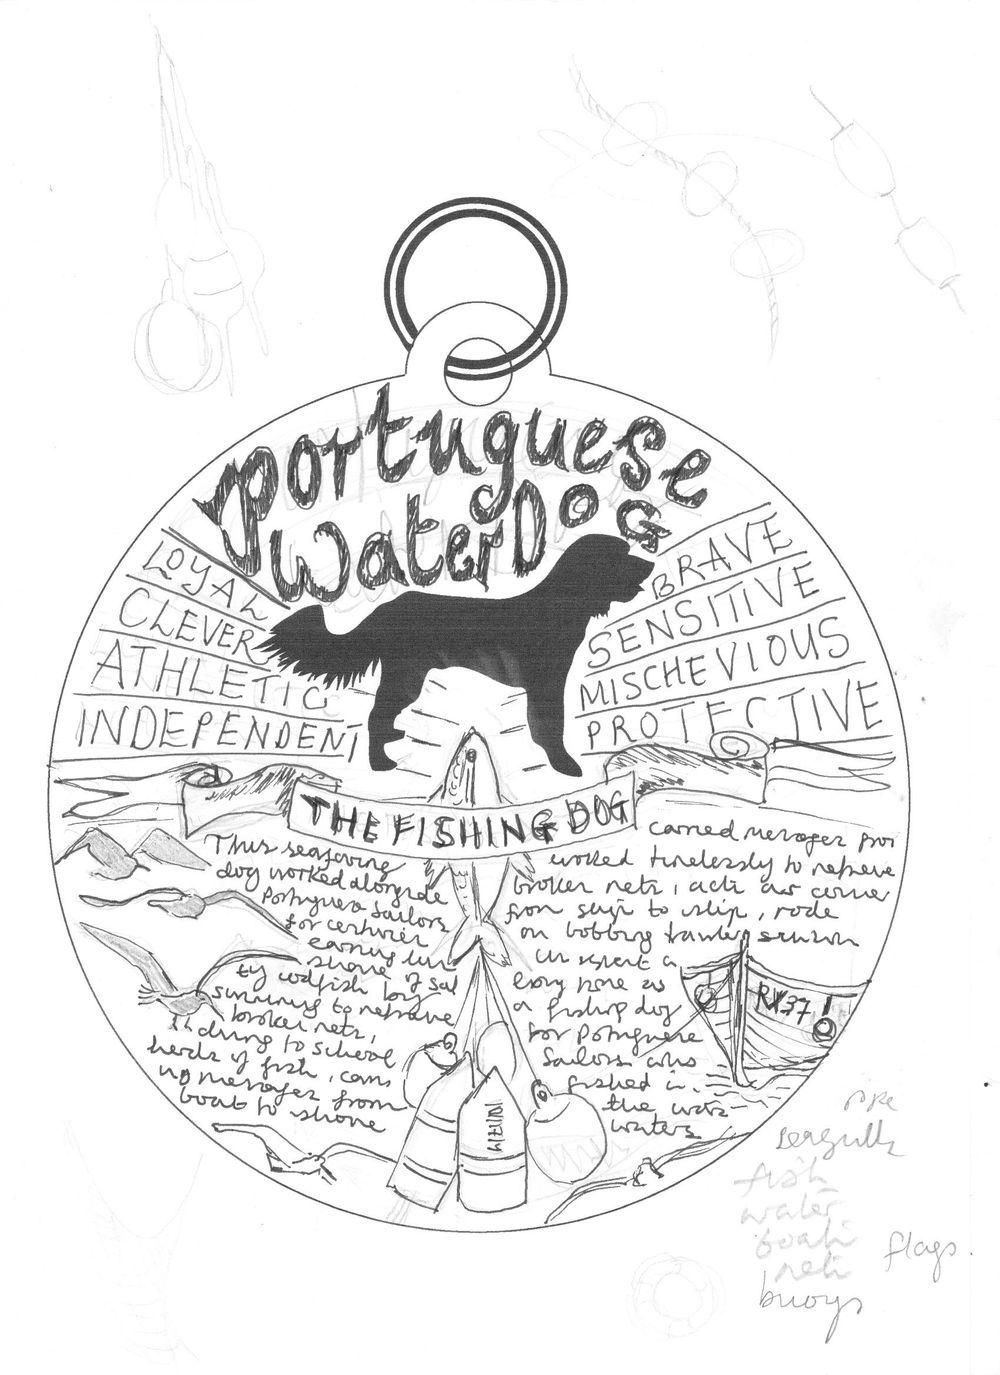 Dog Tag Art Print - image 11 - student project